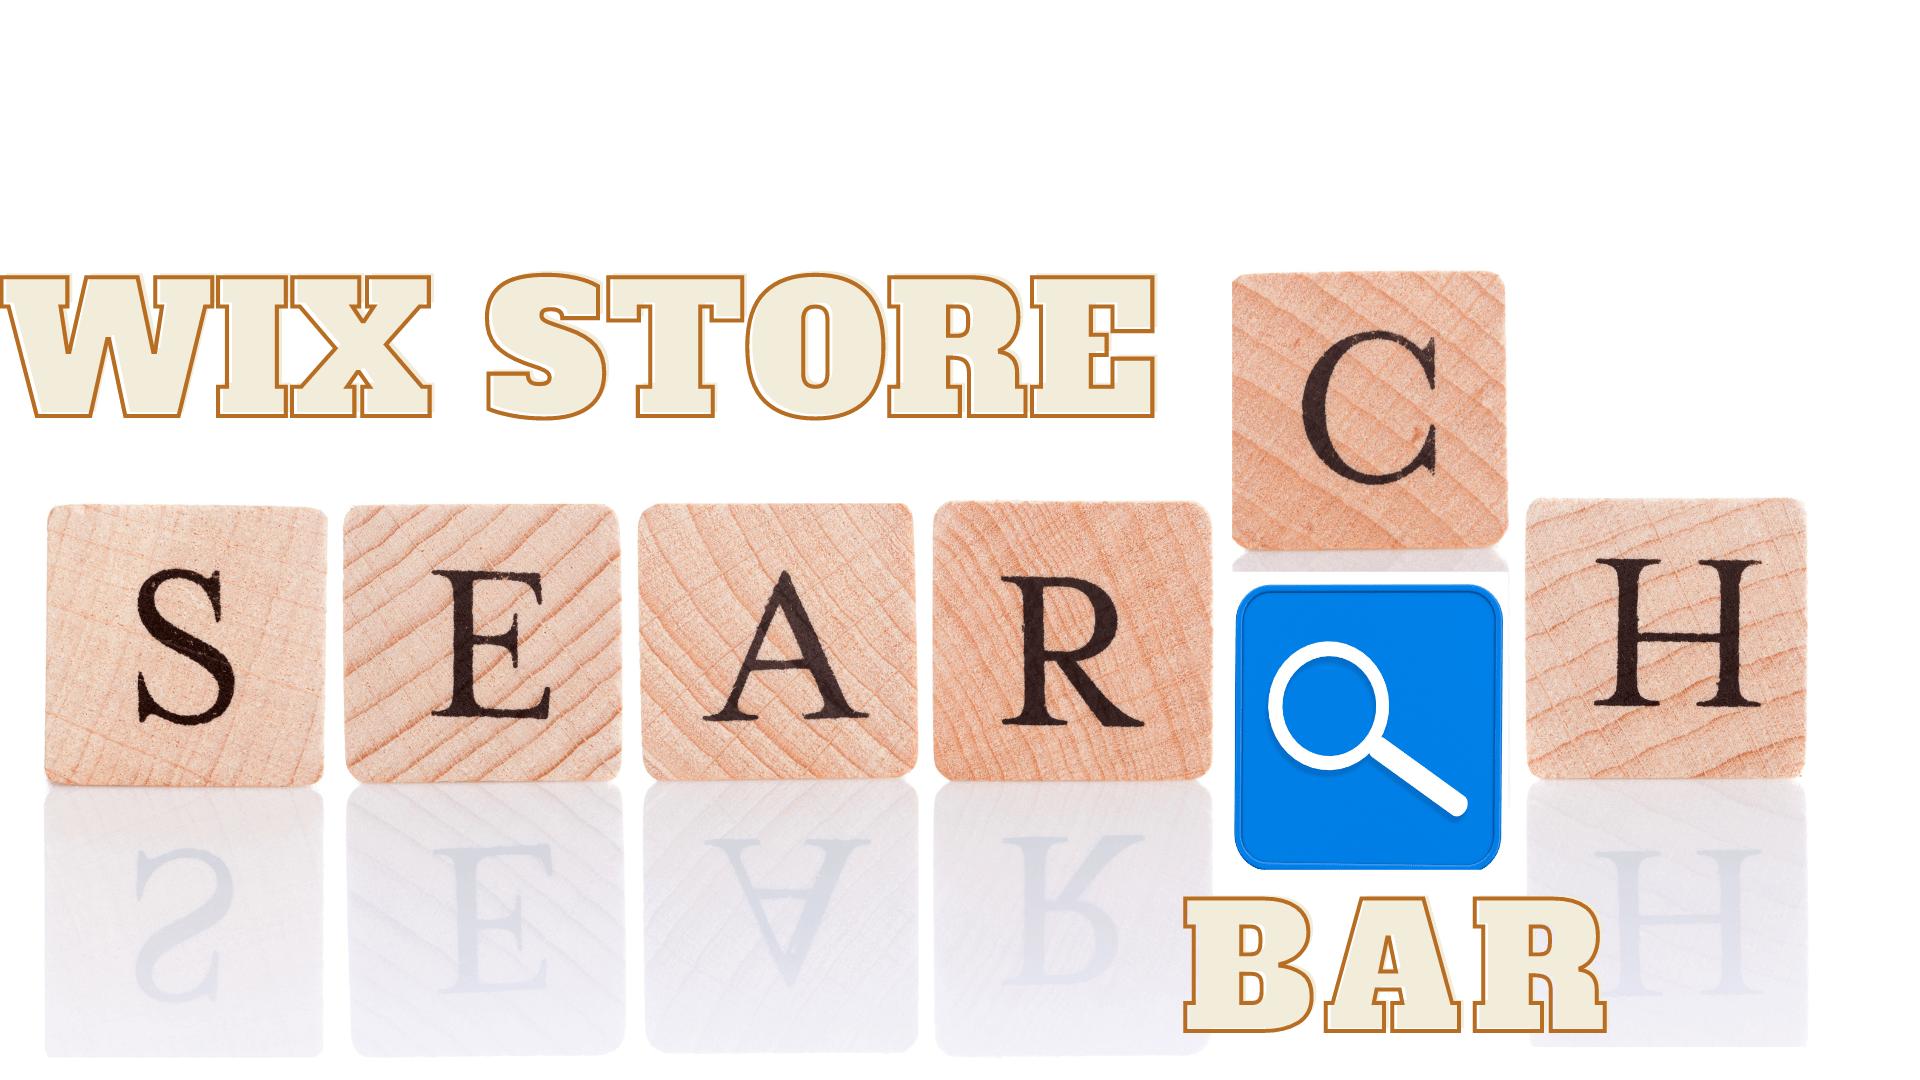 A mini guide to add wix store search bar